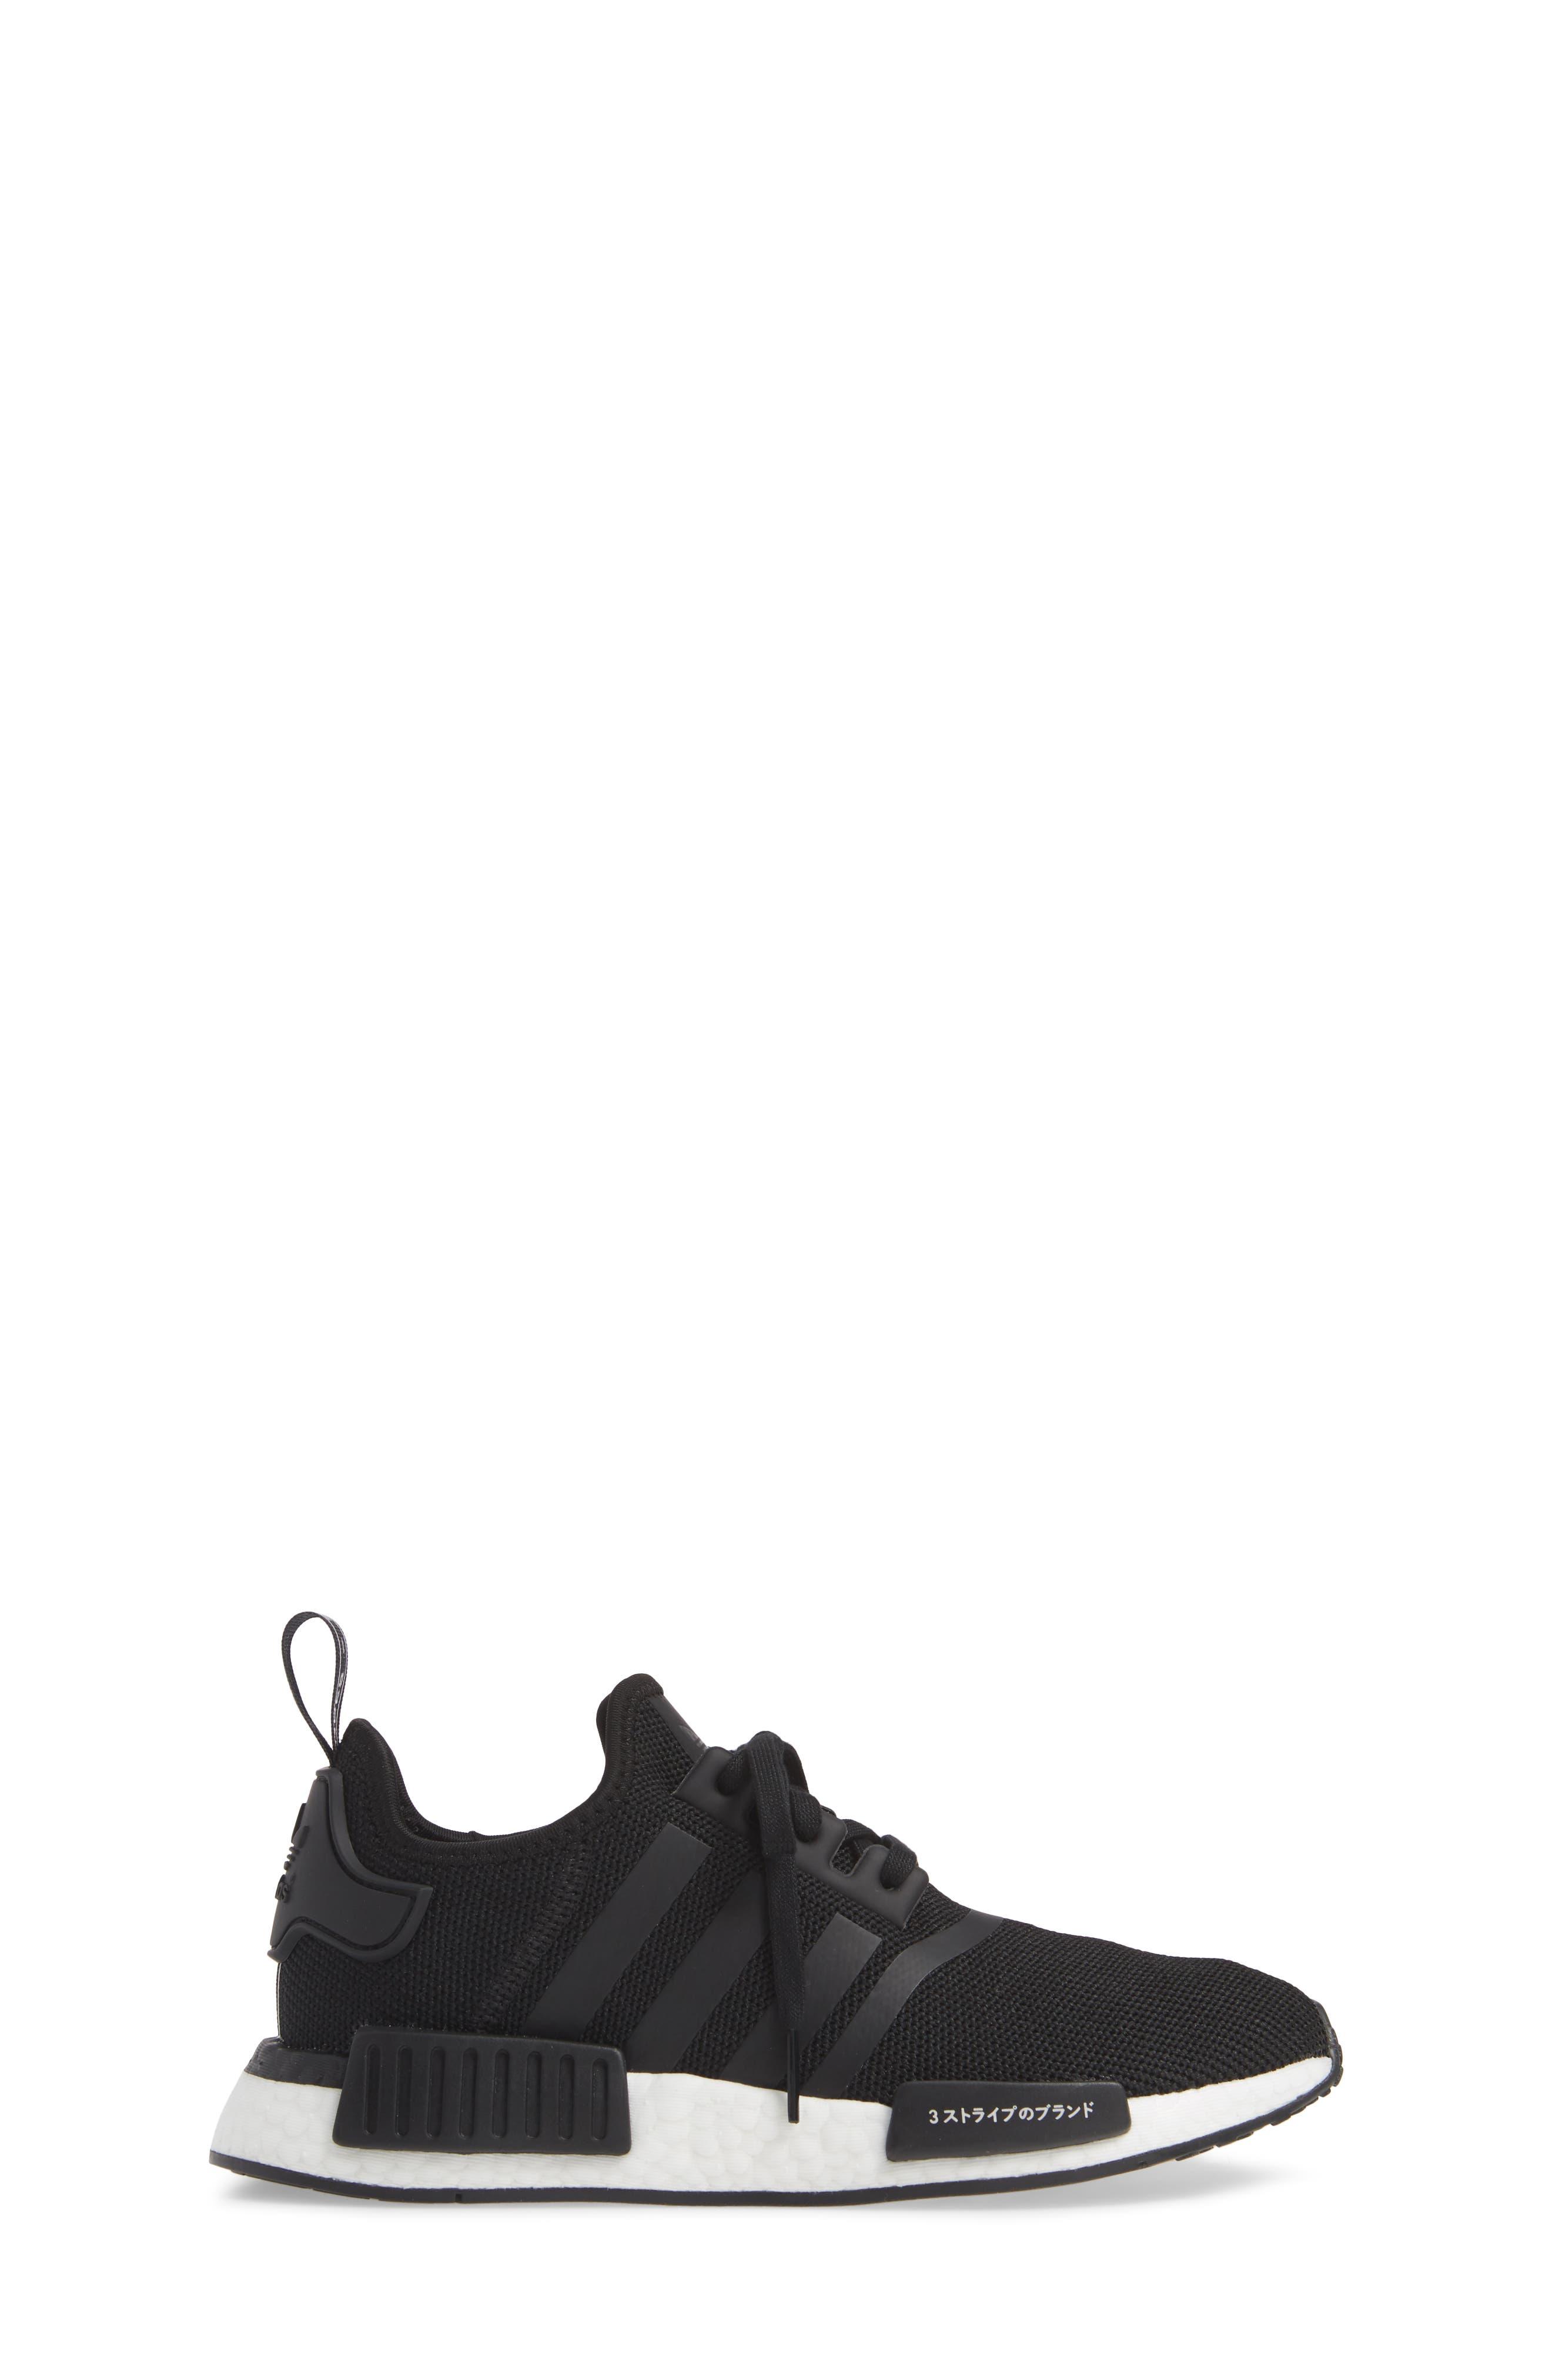 NMD R1 Sneaker,                             Alternate thumbnail 3, color,                             CORE BLACK/ BLACK/ ORCHID TINT